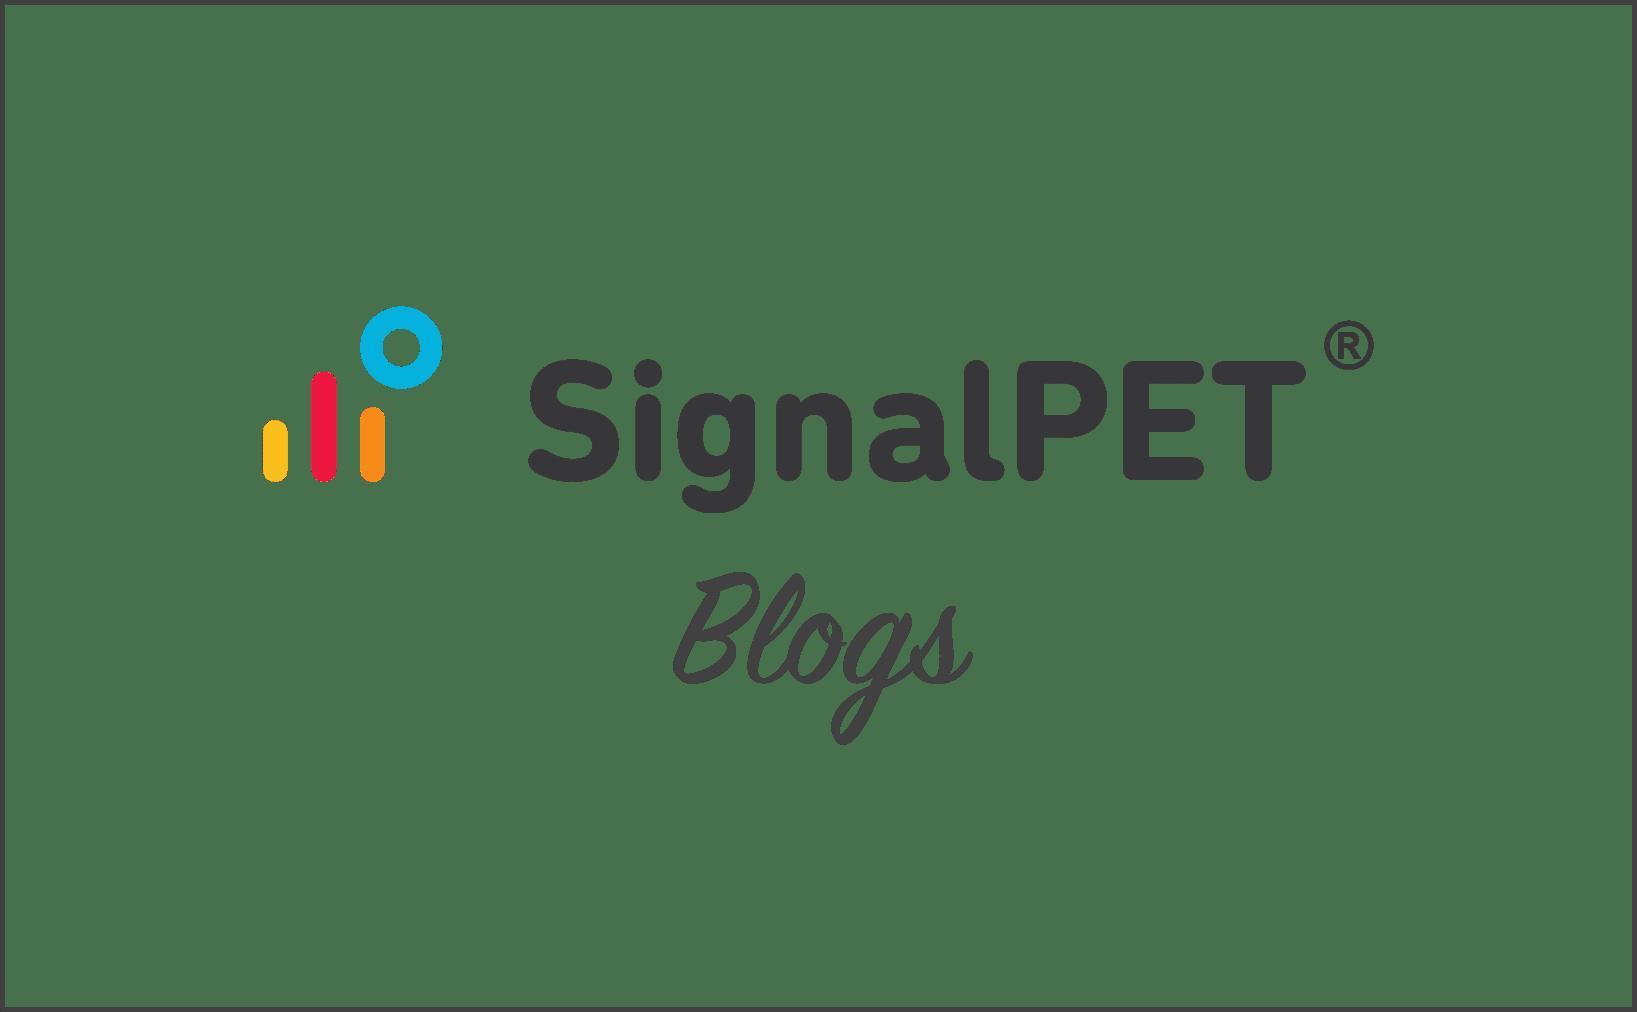 blog_post04